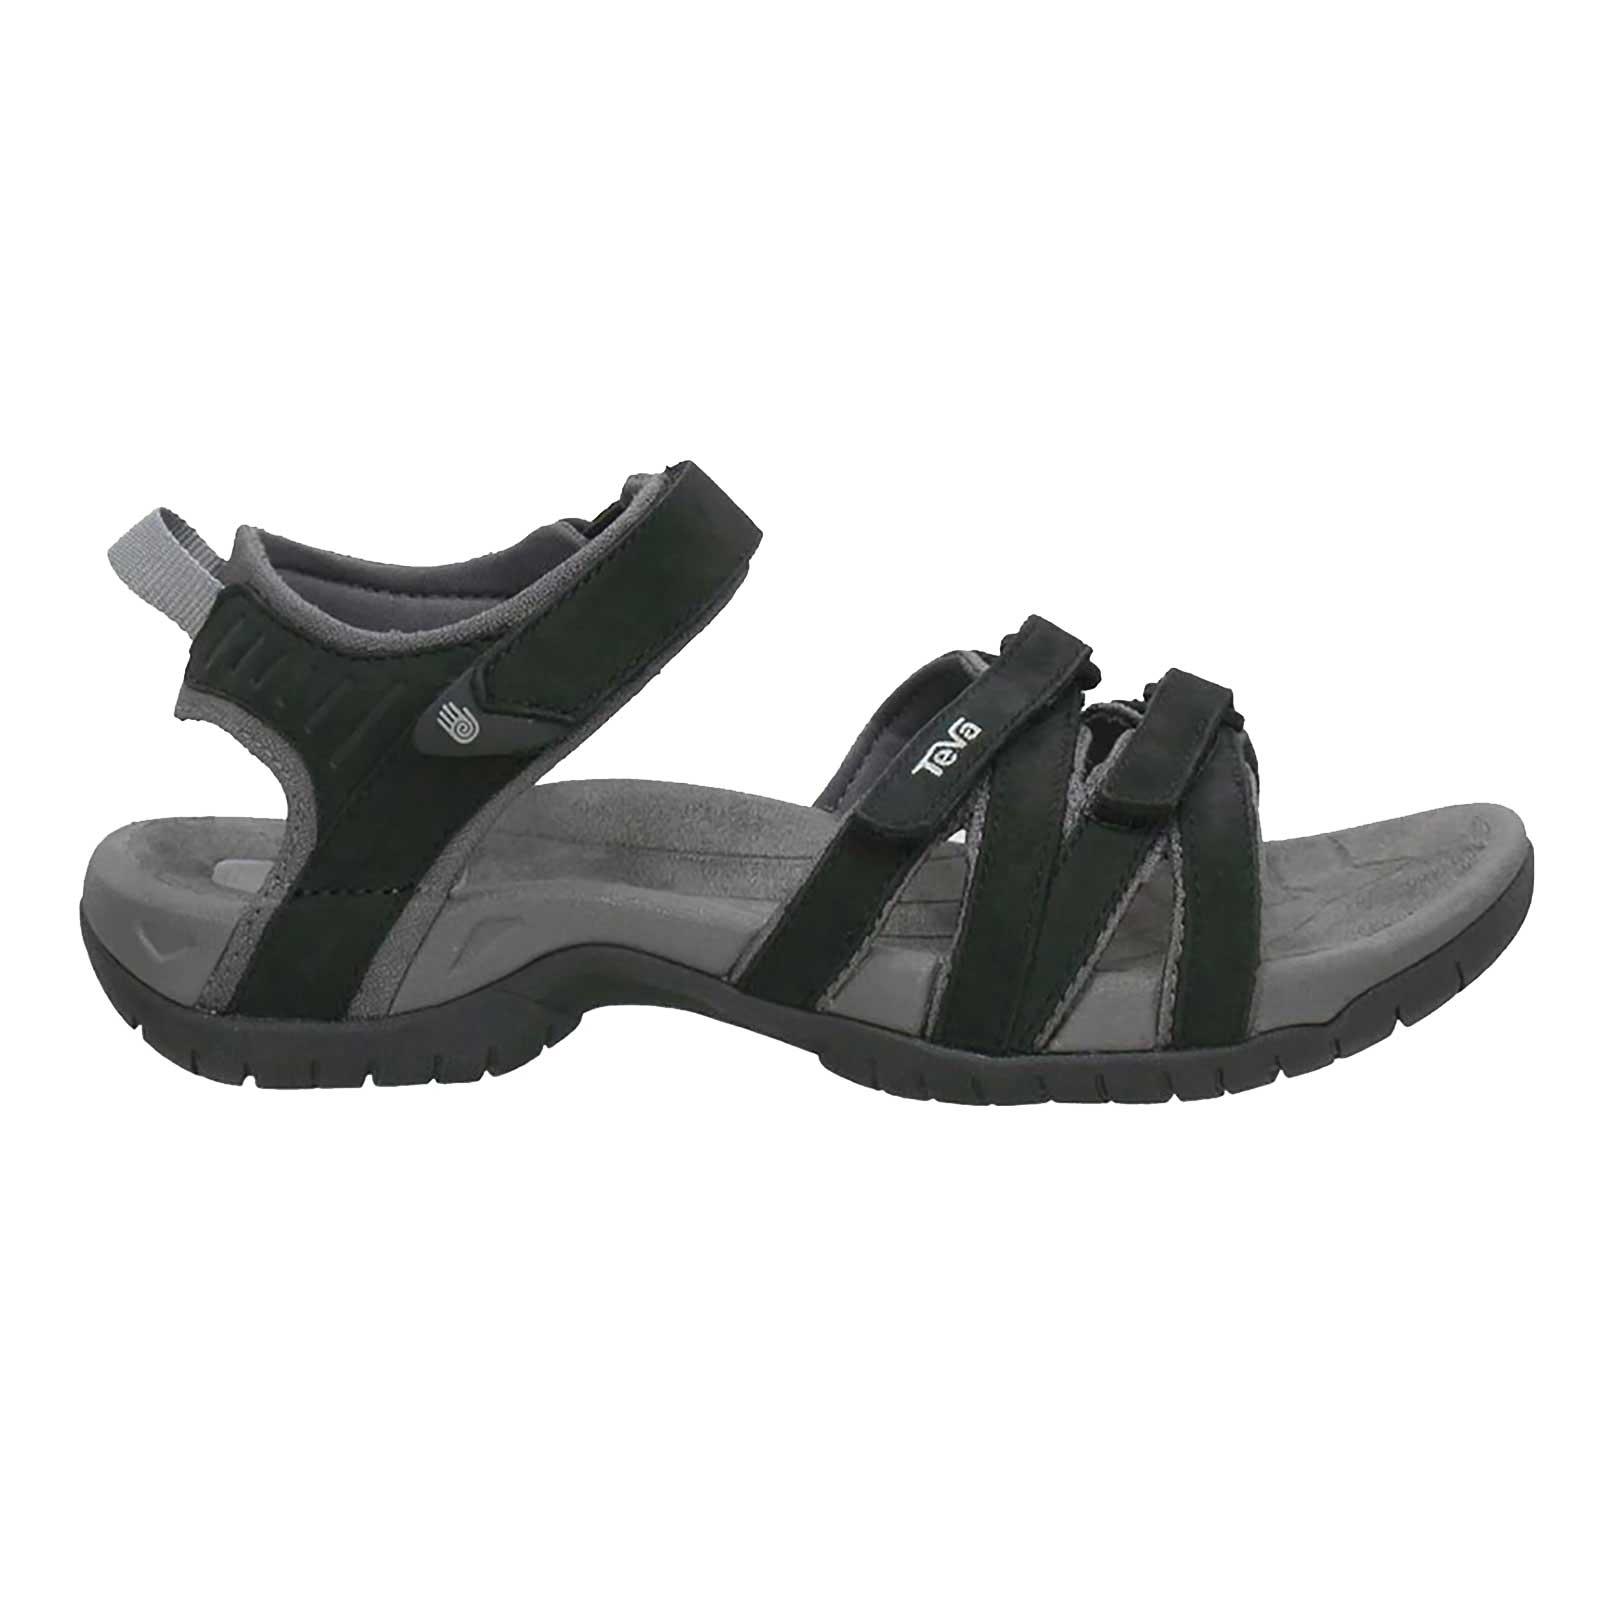 Teva Donna Tirra sandalo pelle in in sandalo pelle sandalo 4eb468   9acf61